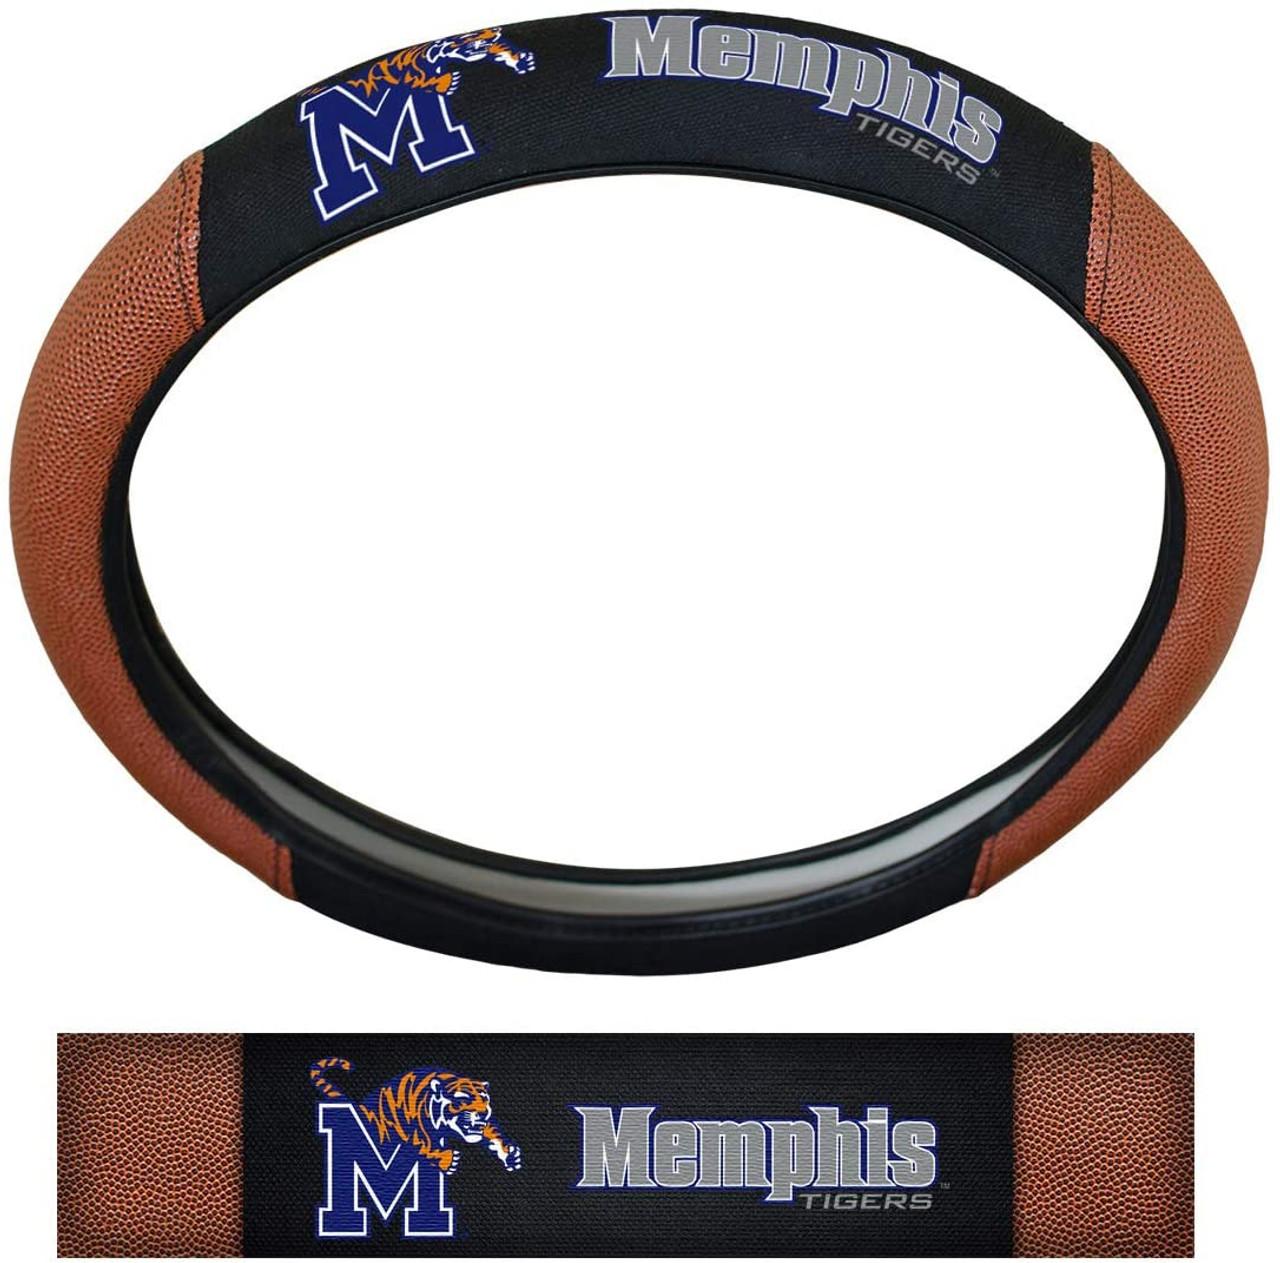 Memphis Tigers Steering Wheel Cover Premium Pigskin Style - Special Order